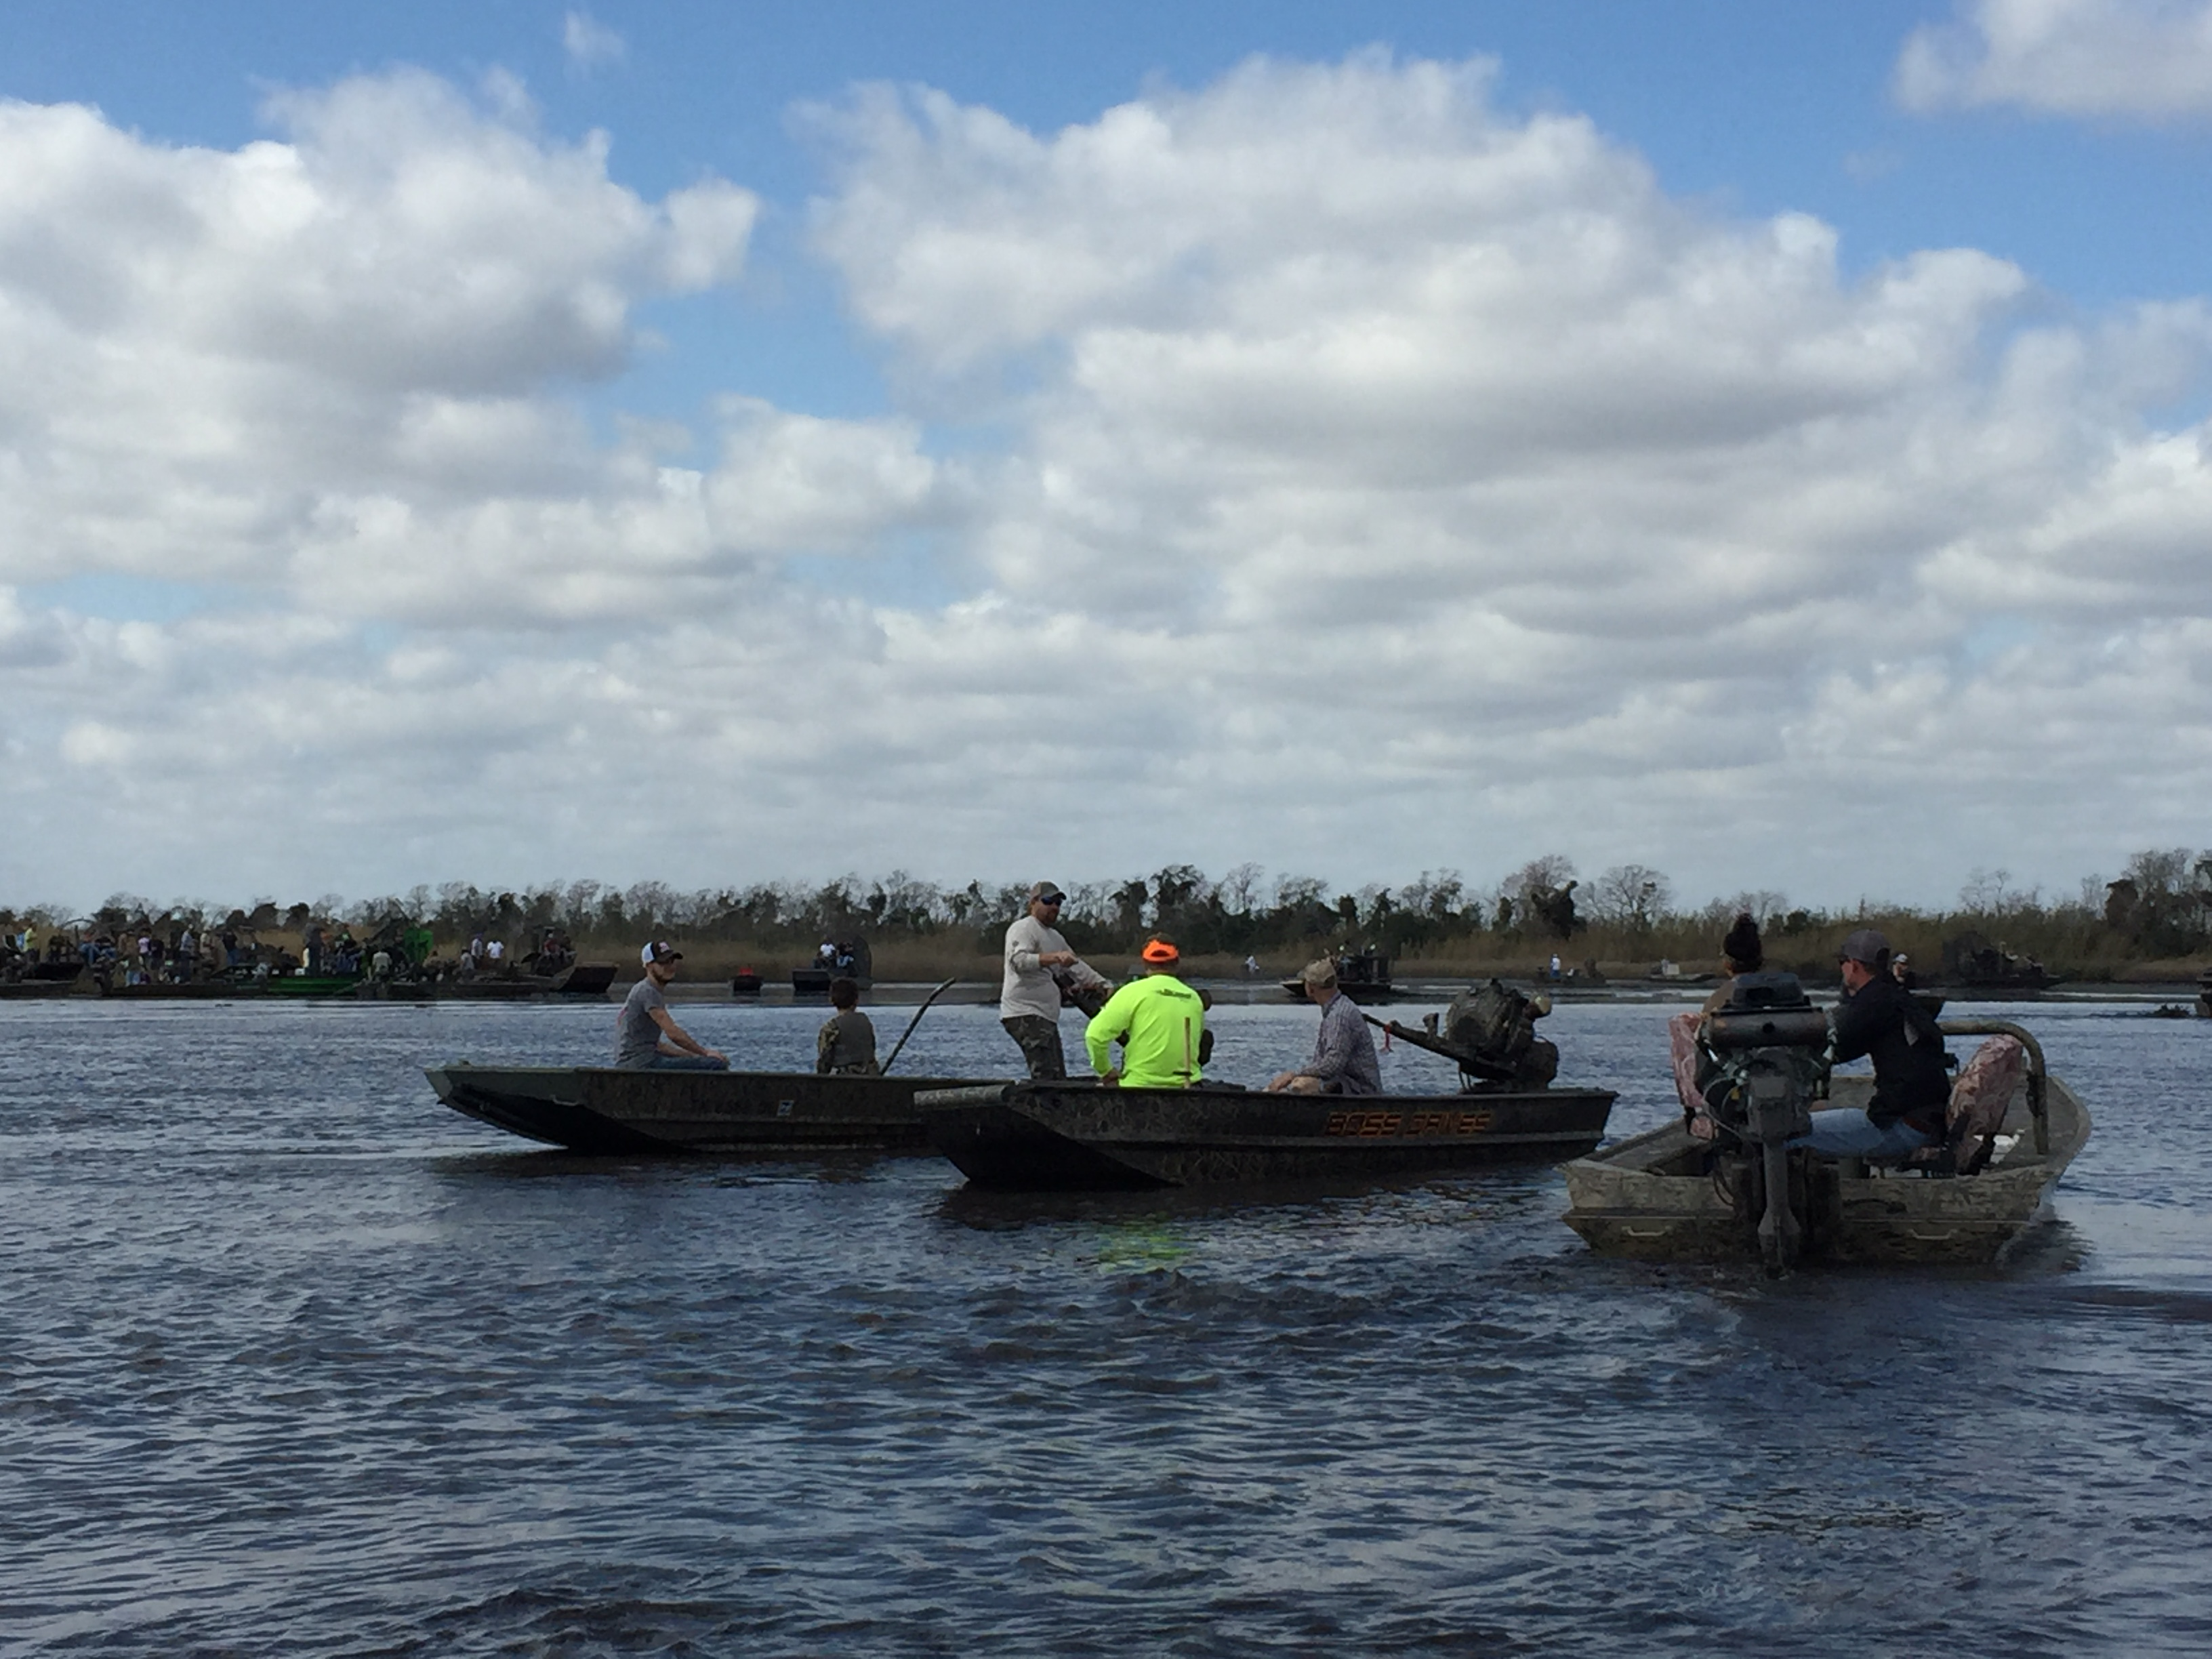 Mud Boats in Bridge City, Texas